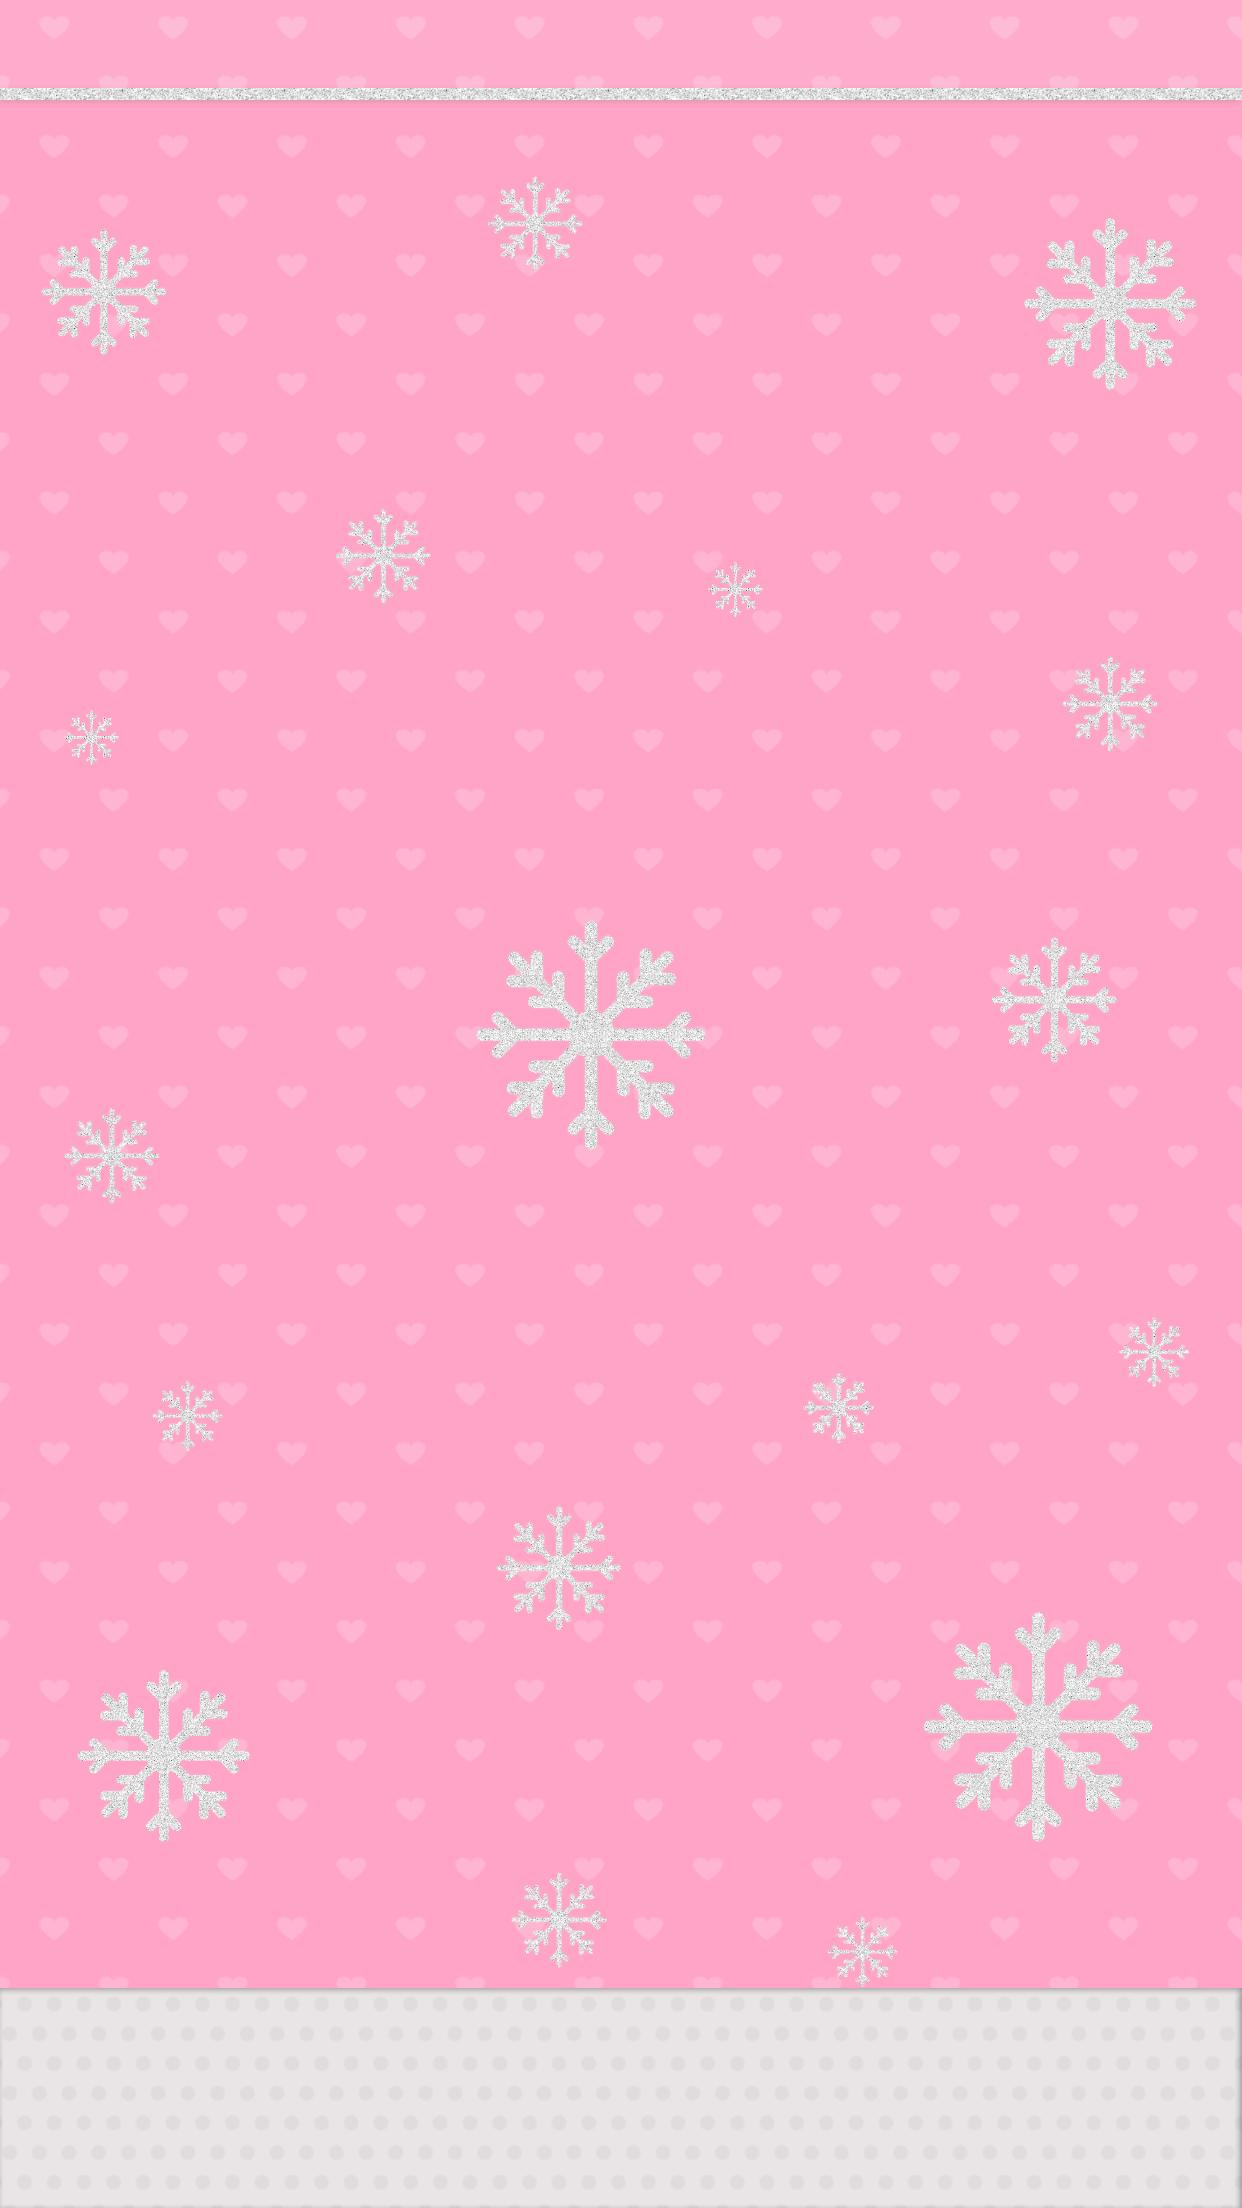 Cute Pink Snowflakes Christmas Wallpaper Christmas Wallpaper Iphone Cute Wallpaper Iphone Christmas Wallpaper Iphone Cute